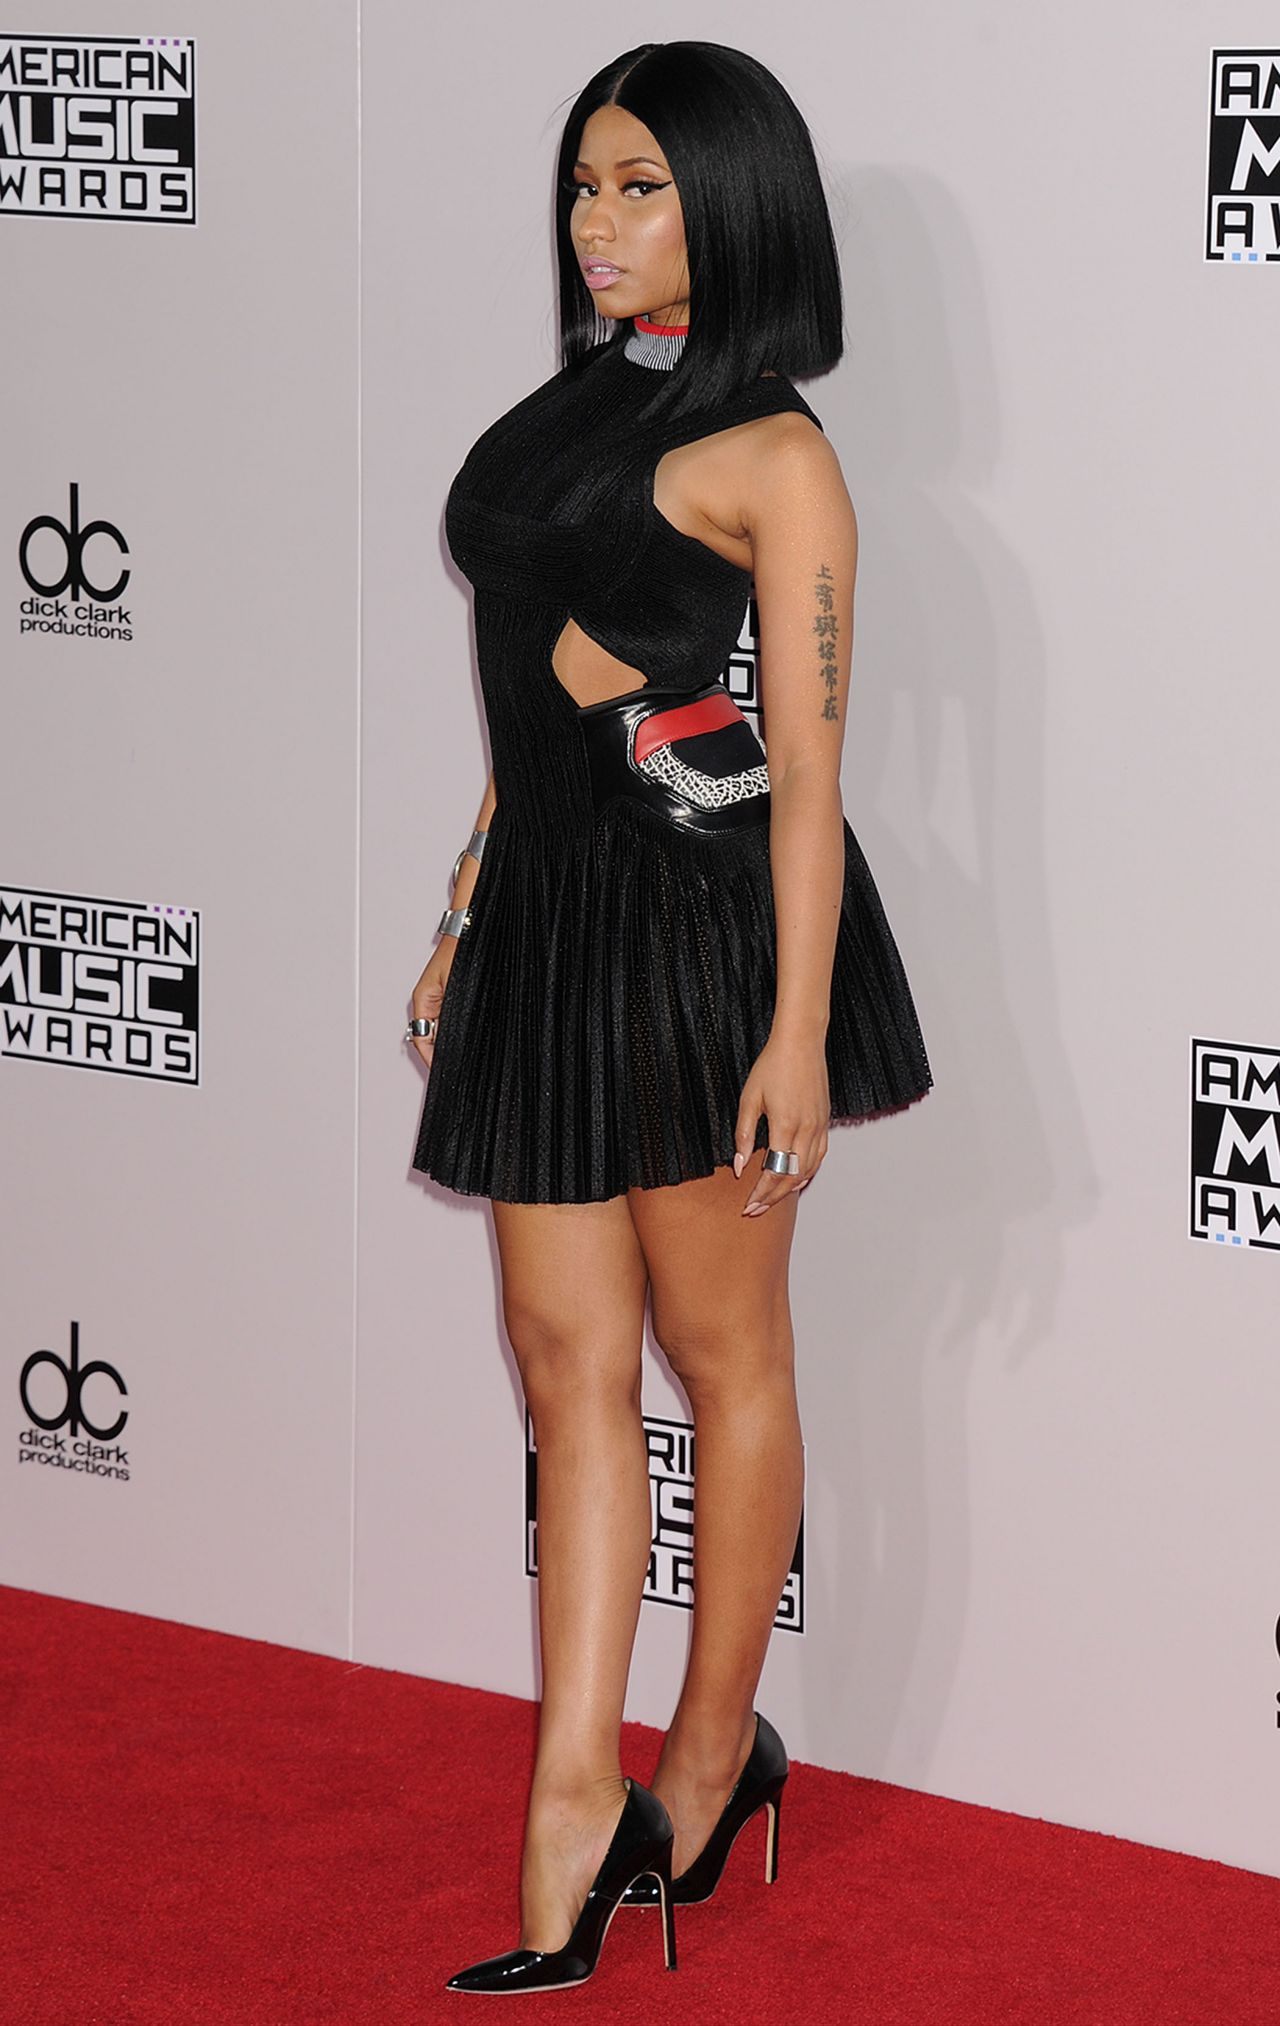 Nicki Minaj Vma 2017 Dress | Gallery